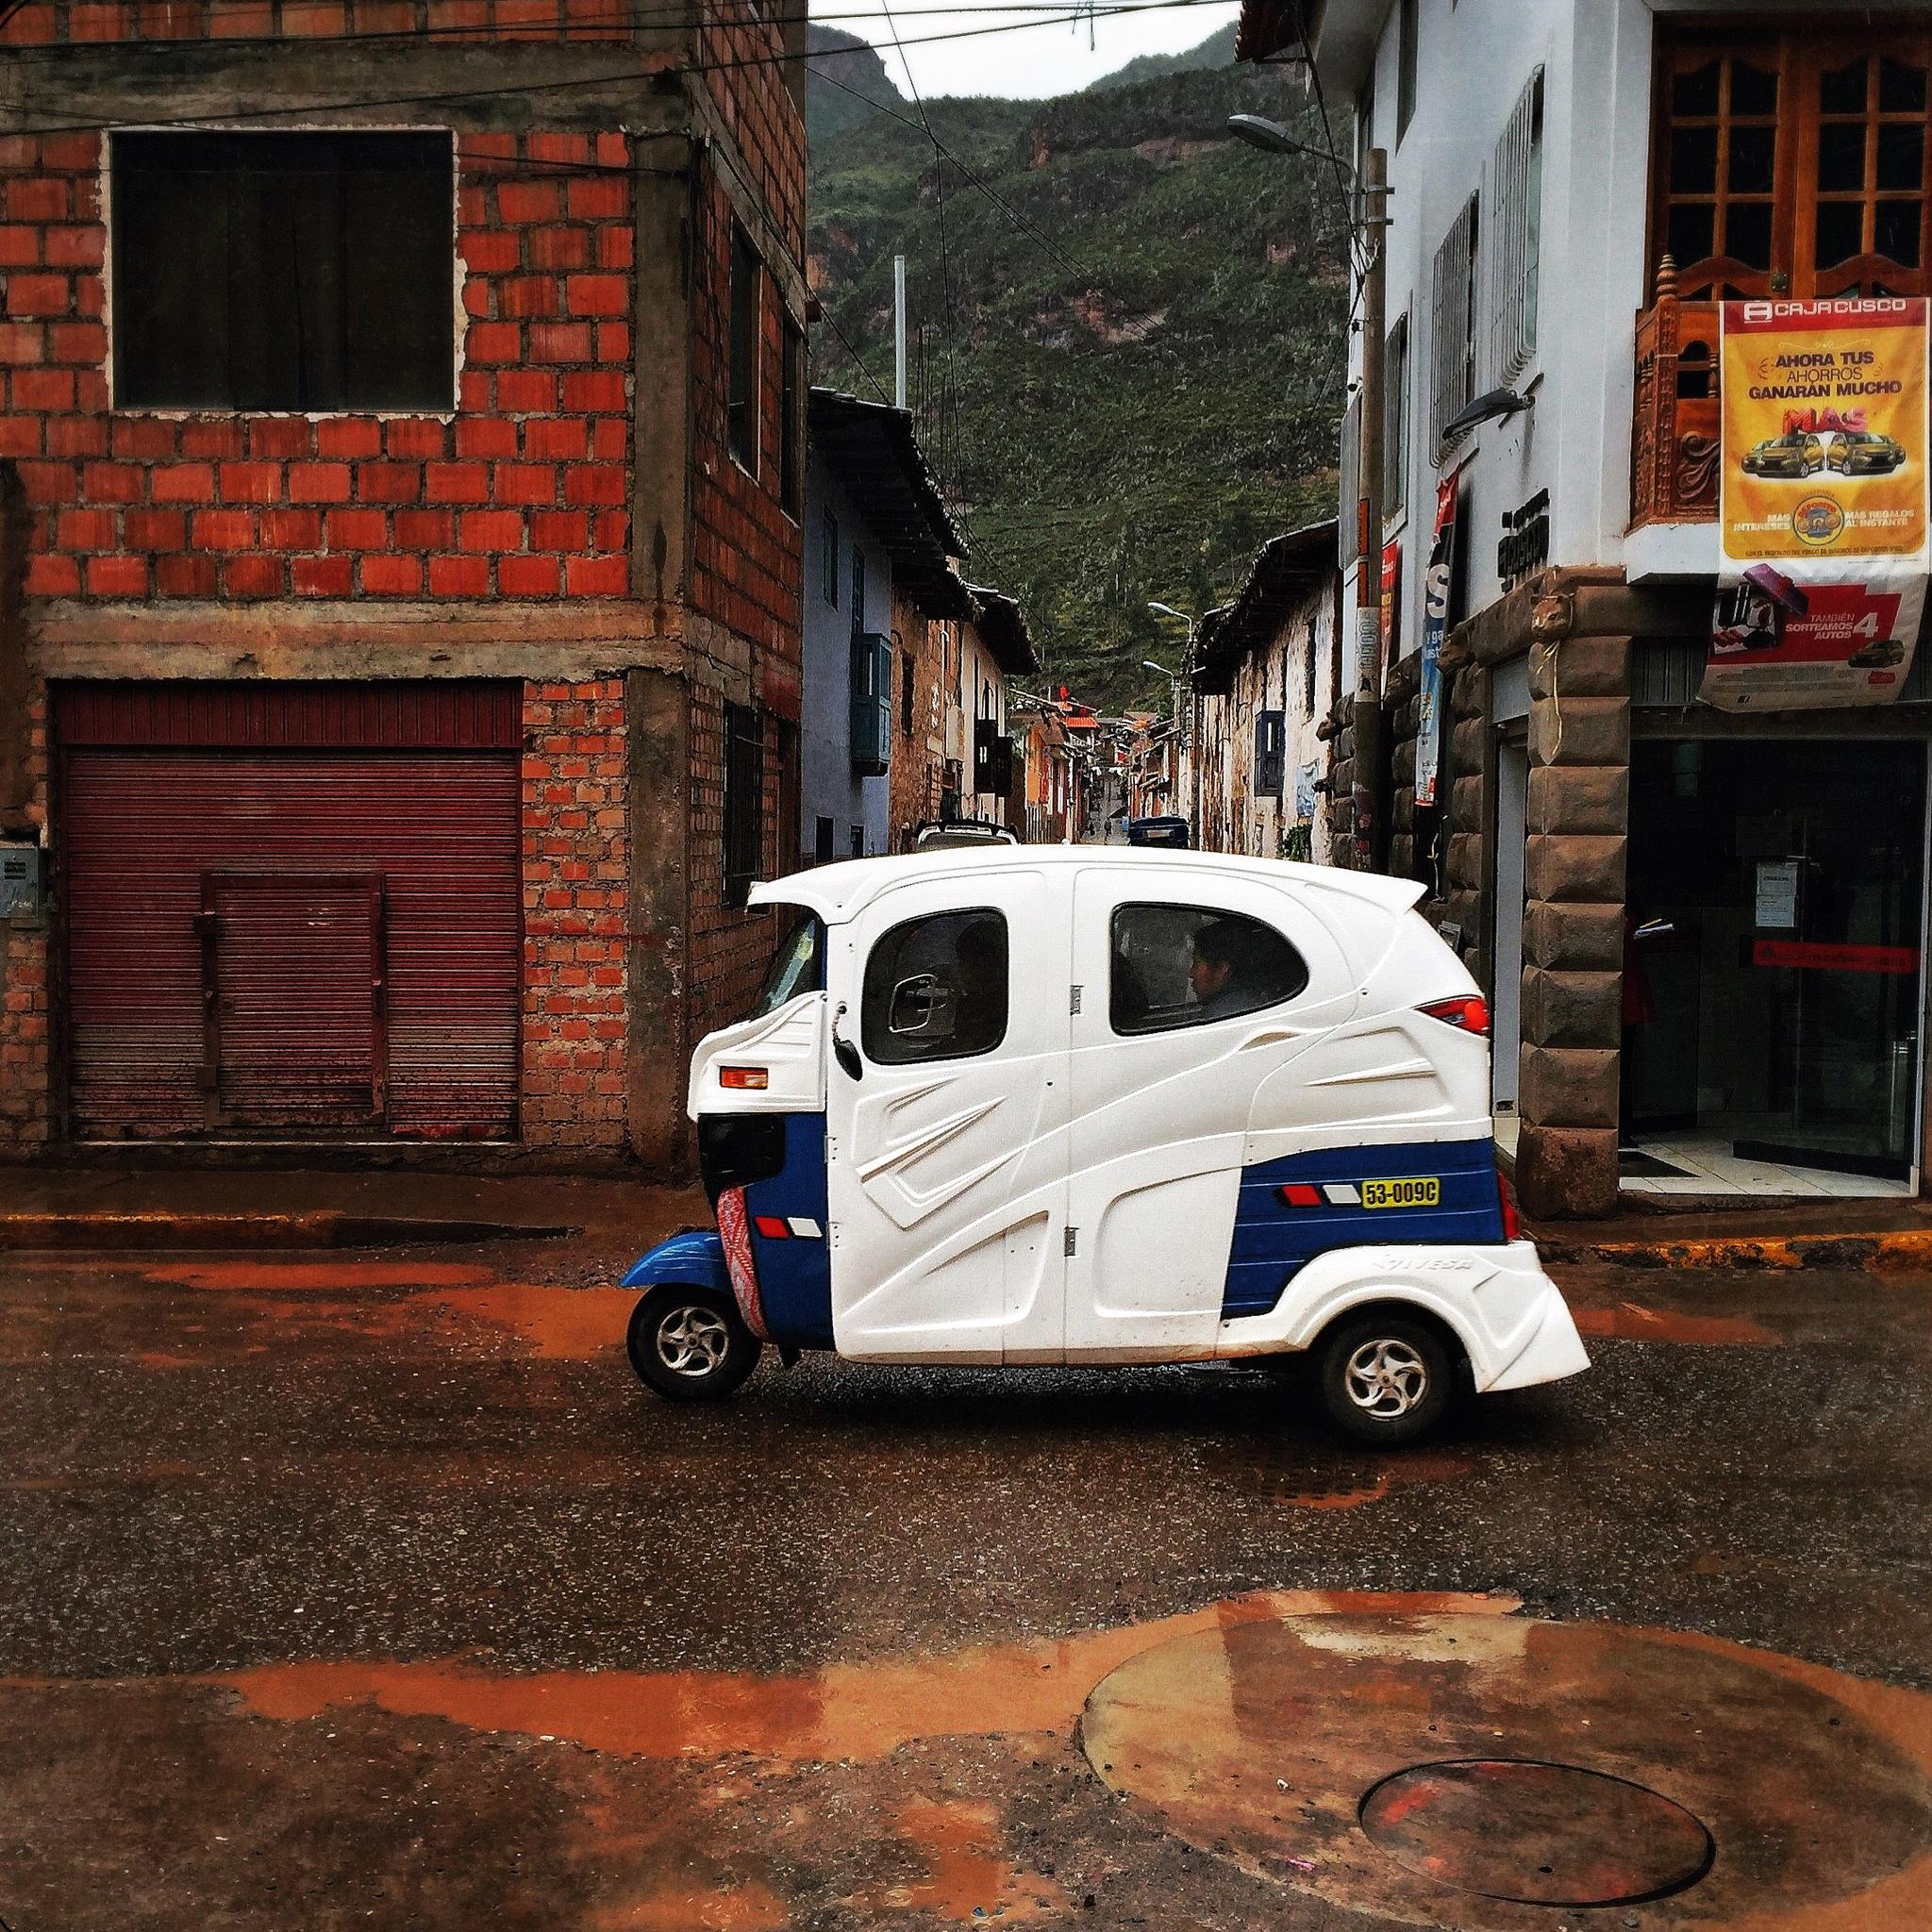 [•] calles.d.Pisac, Cusco, Perú _ 2.16 by [º] r e v e r s i d e _